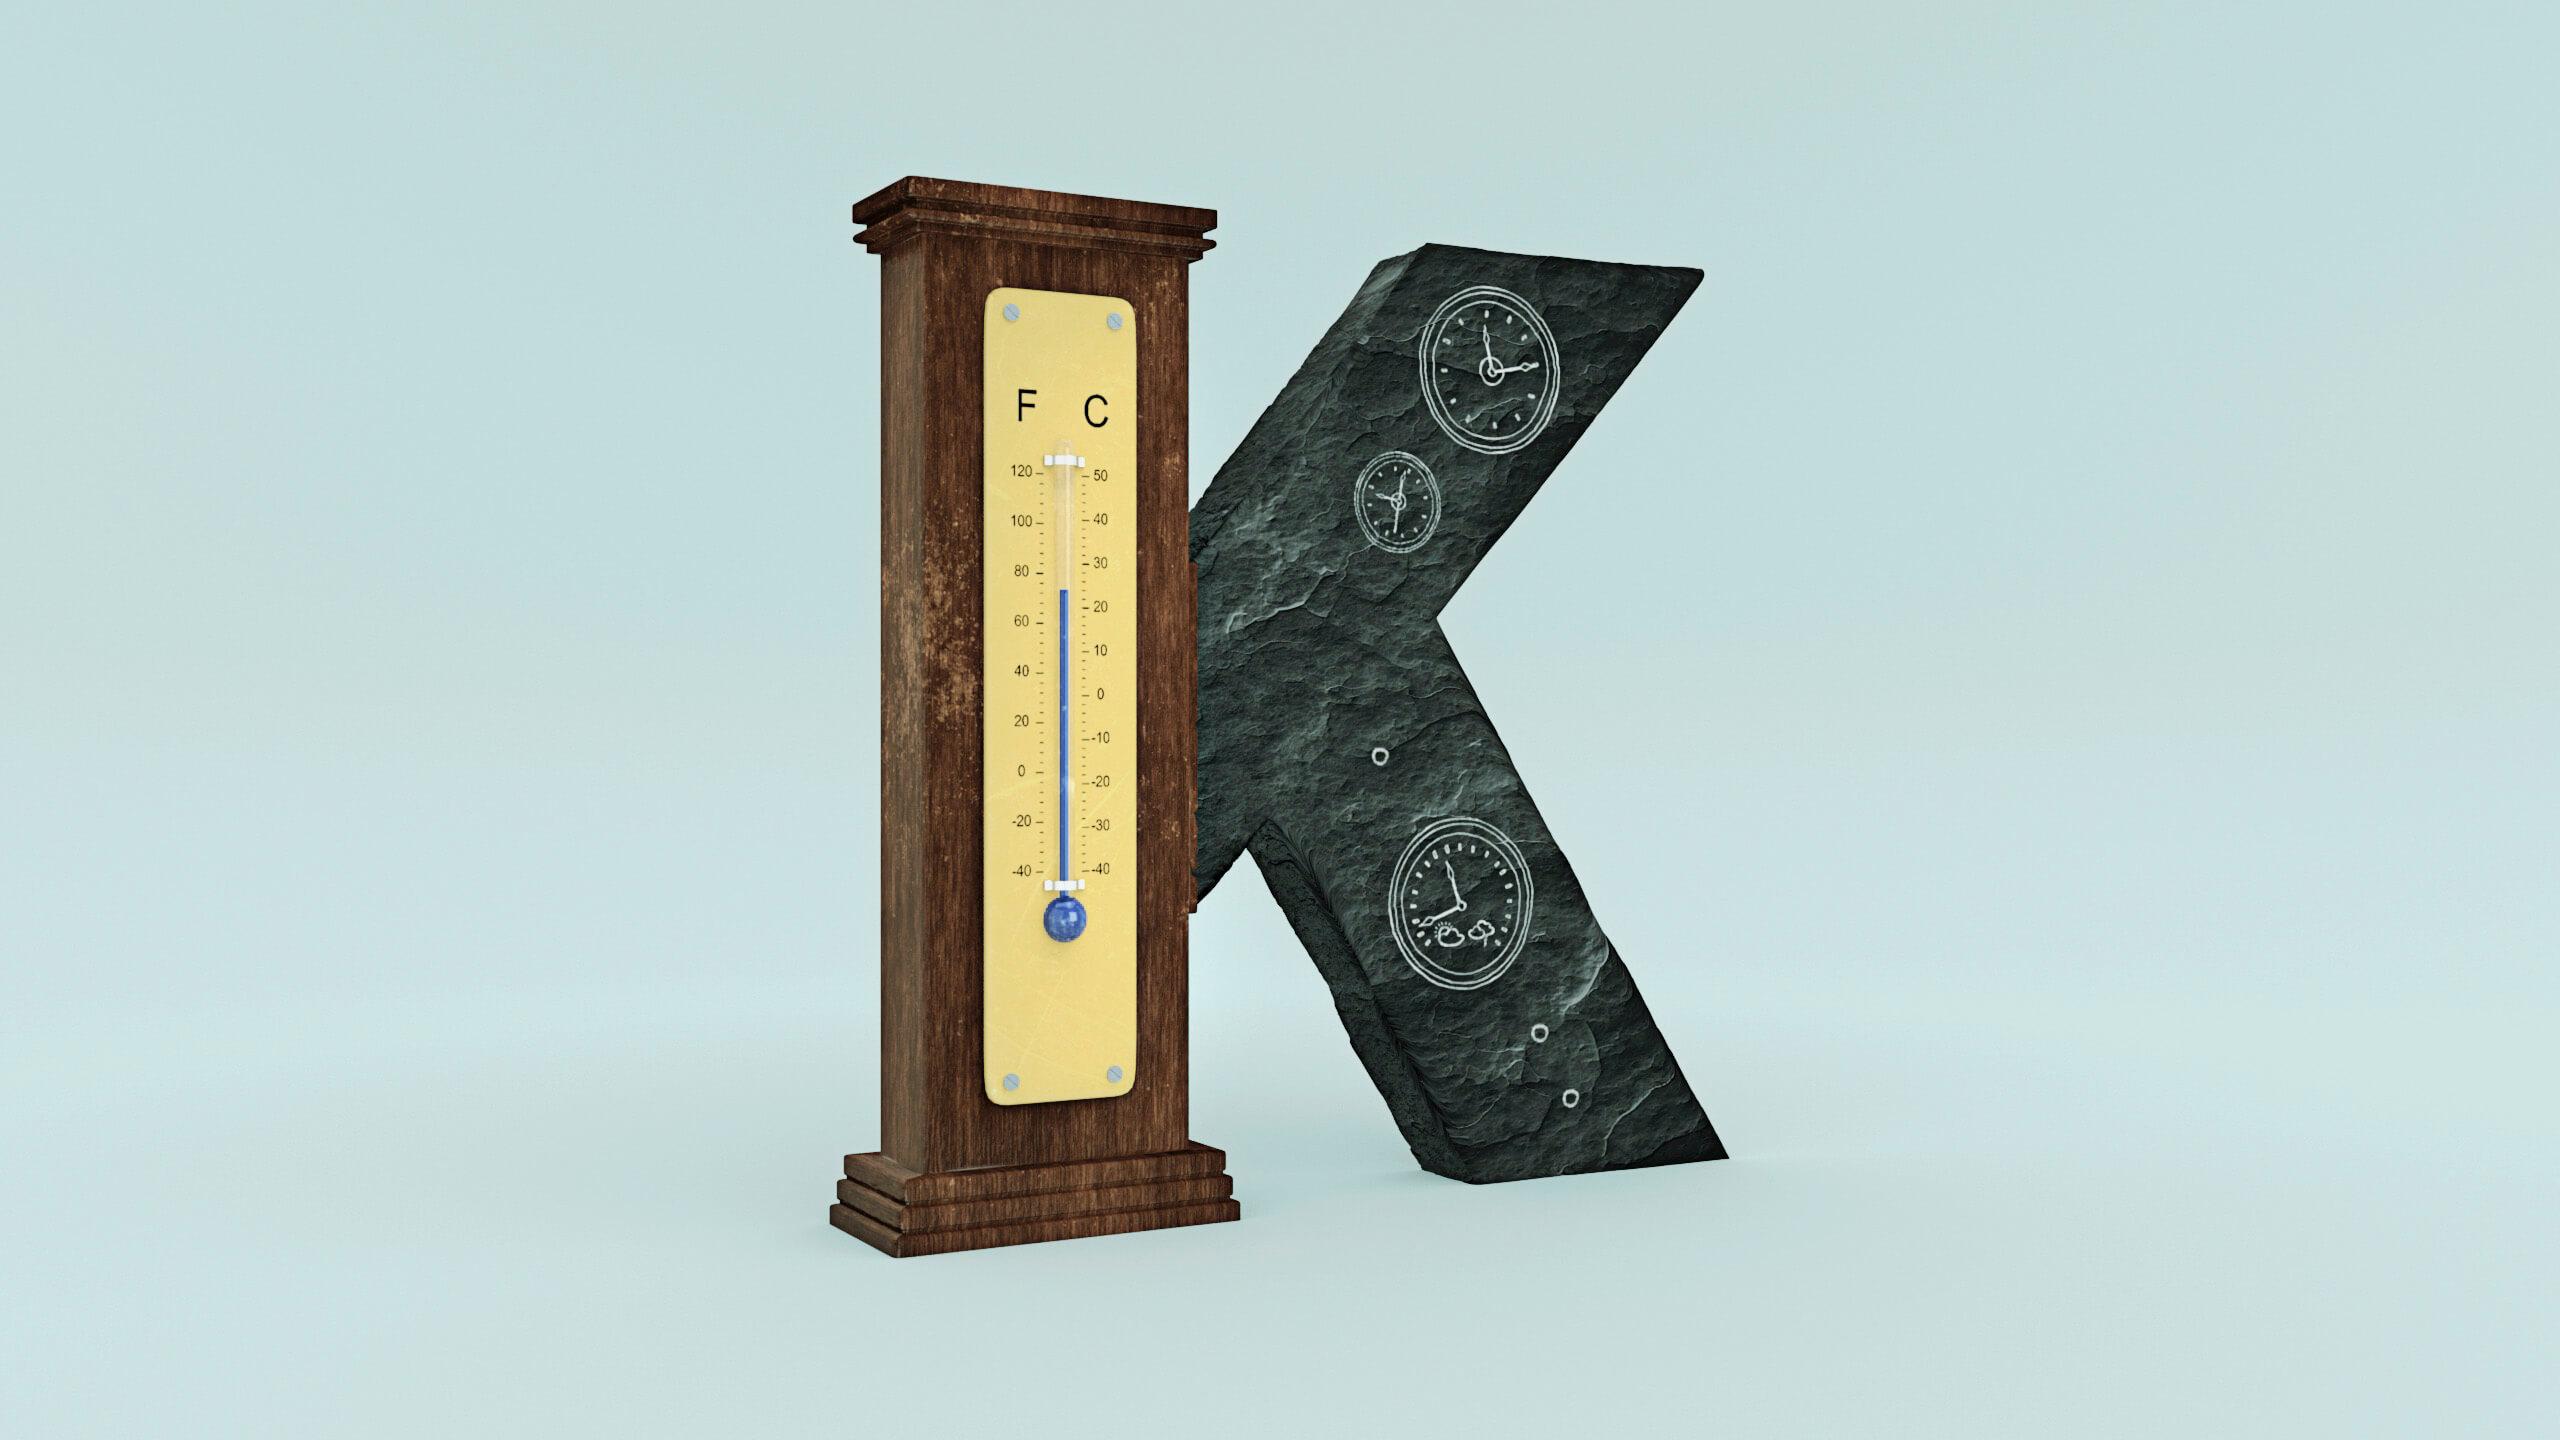 K-Klassenklima_2560x1440_300